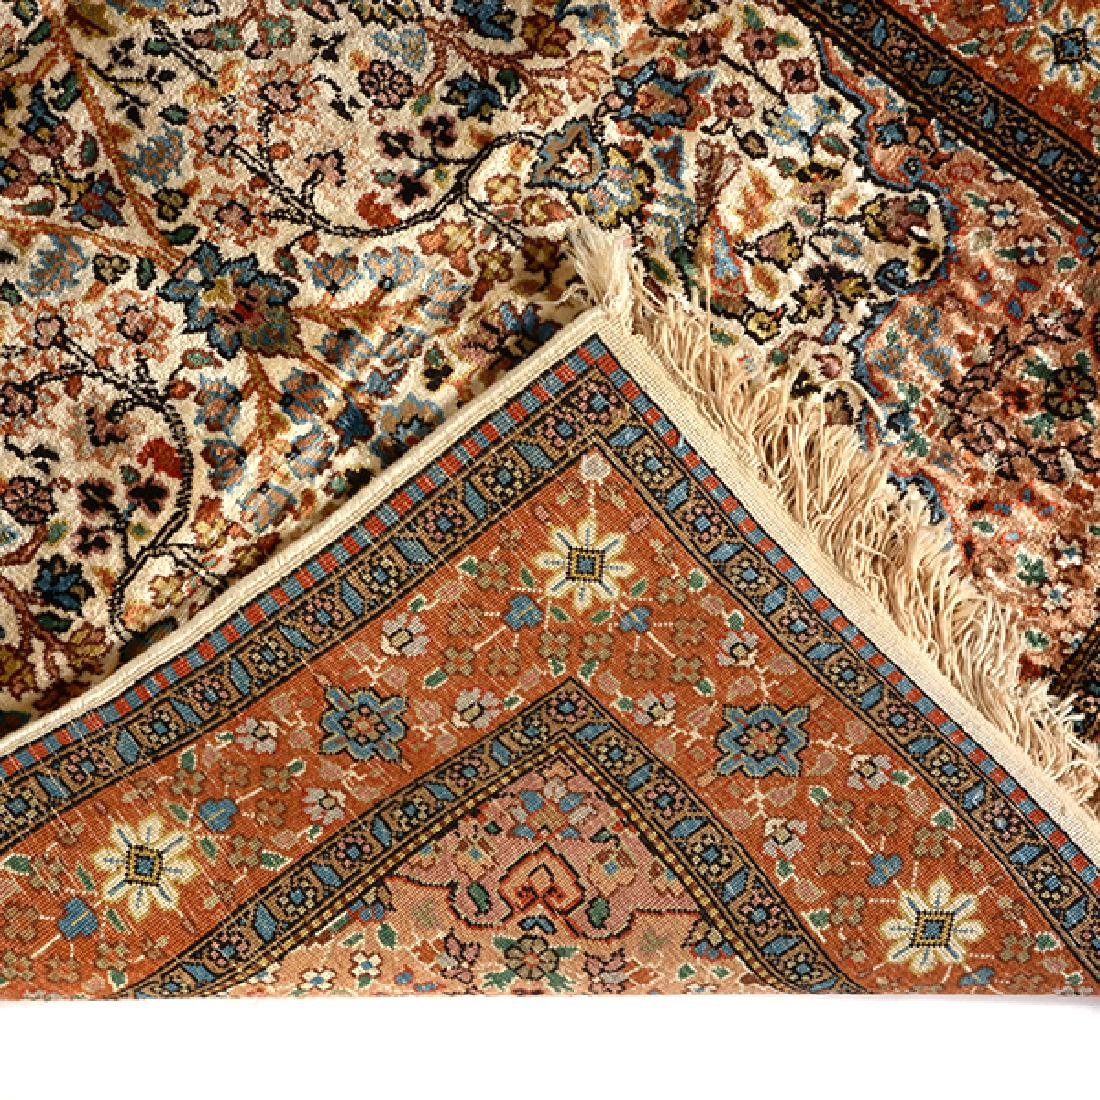 Egyptian Silk Prayer Rug: 2 feet 6 inches x 4 feet 3 - 3